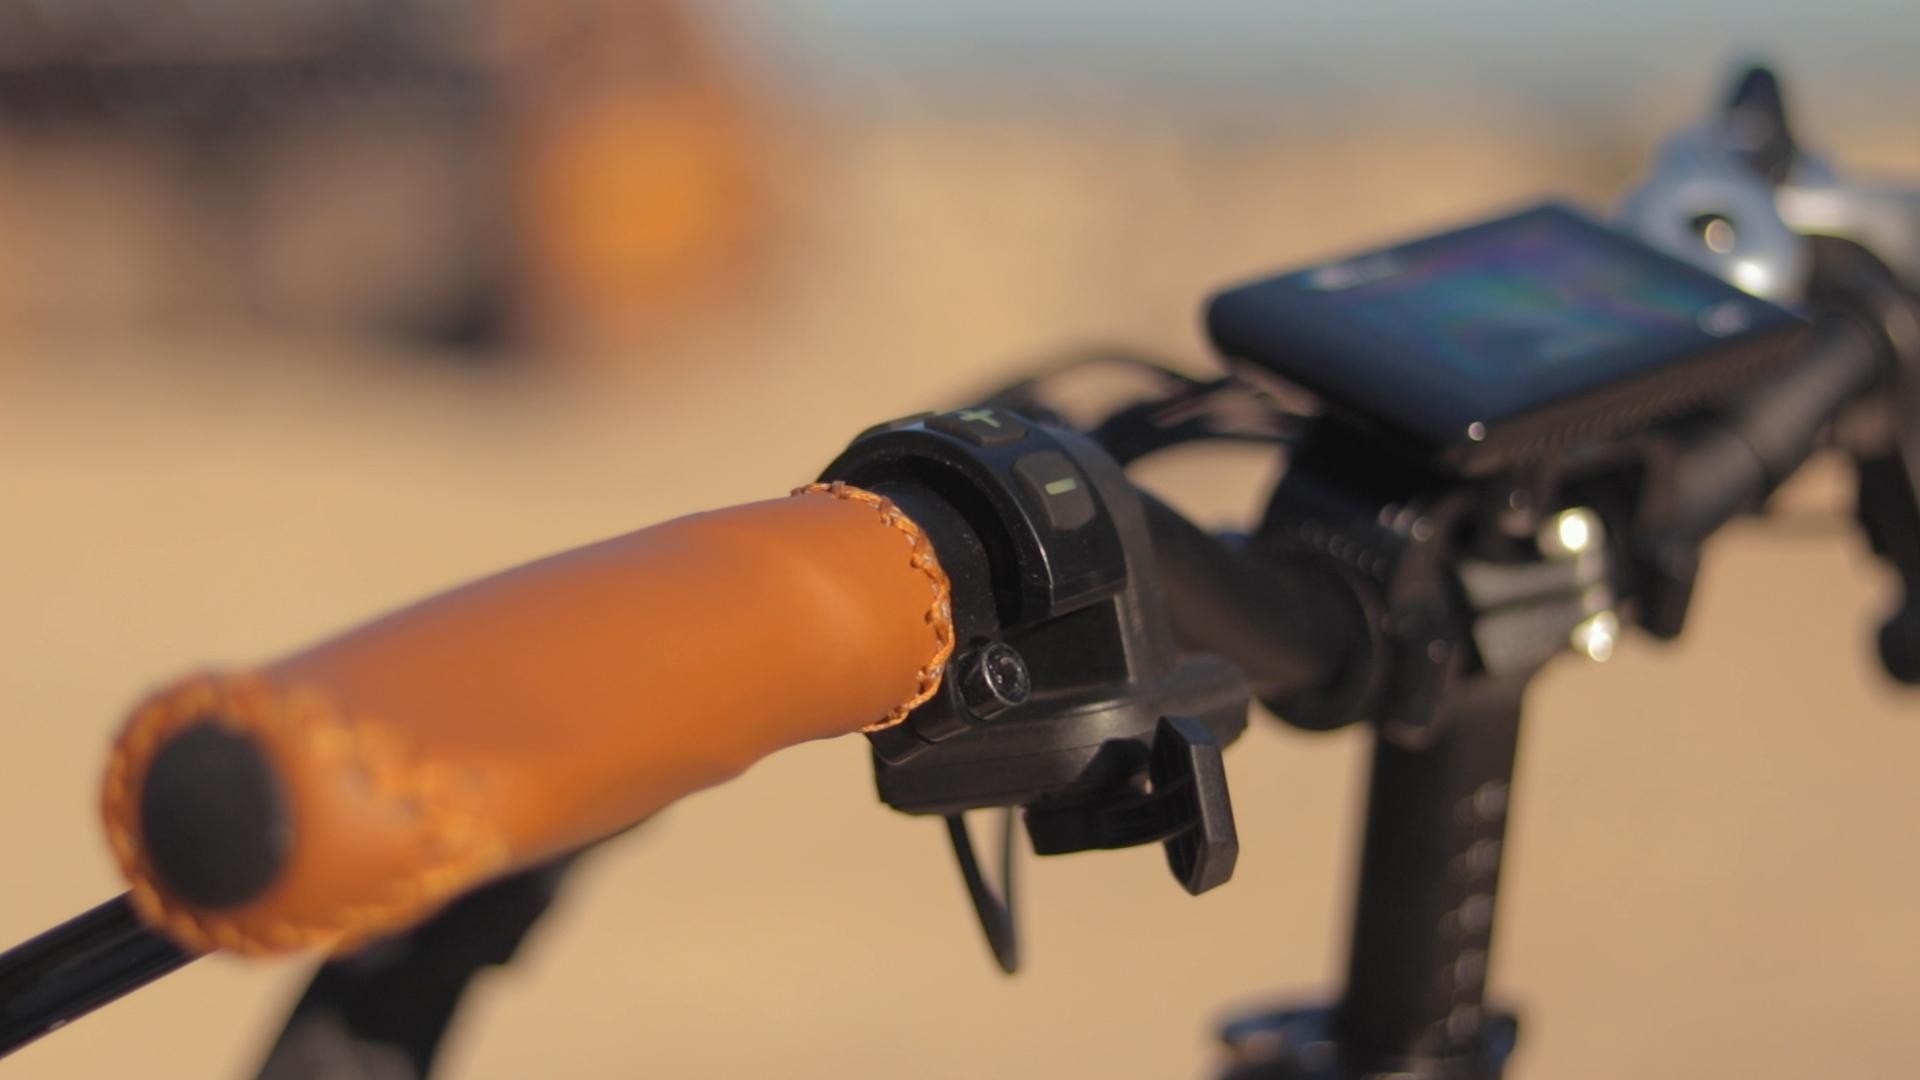 electrified-reviews-bagibike-b20-premium-electric-bike-review-grip-2.jpg